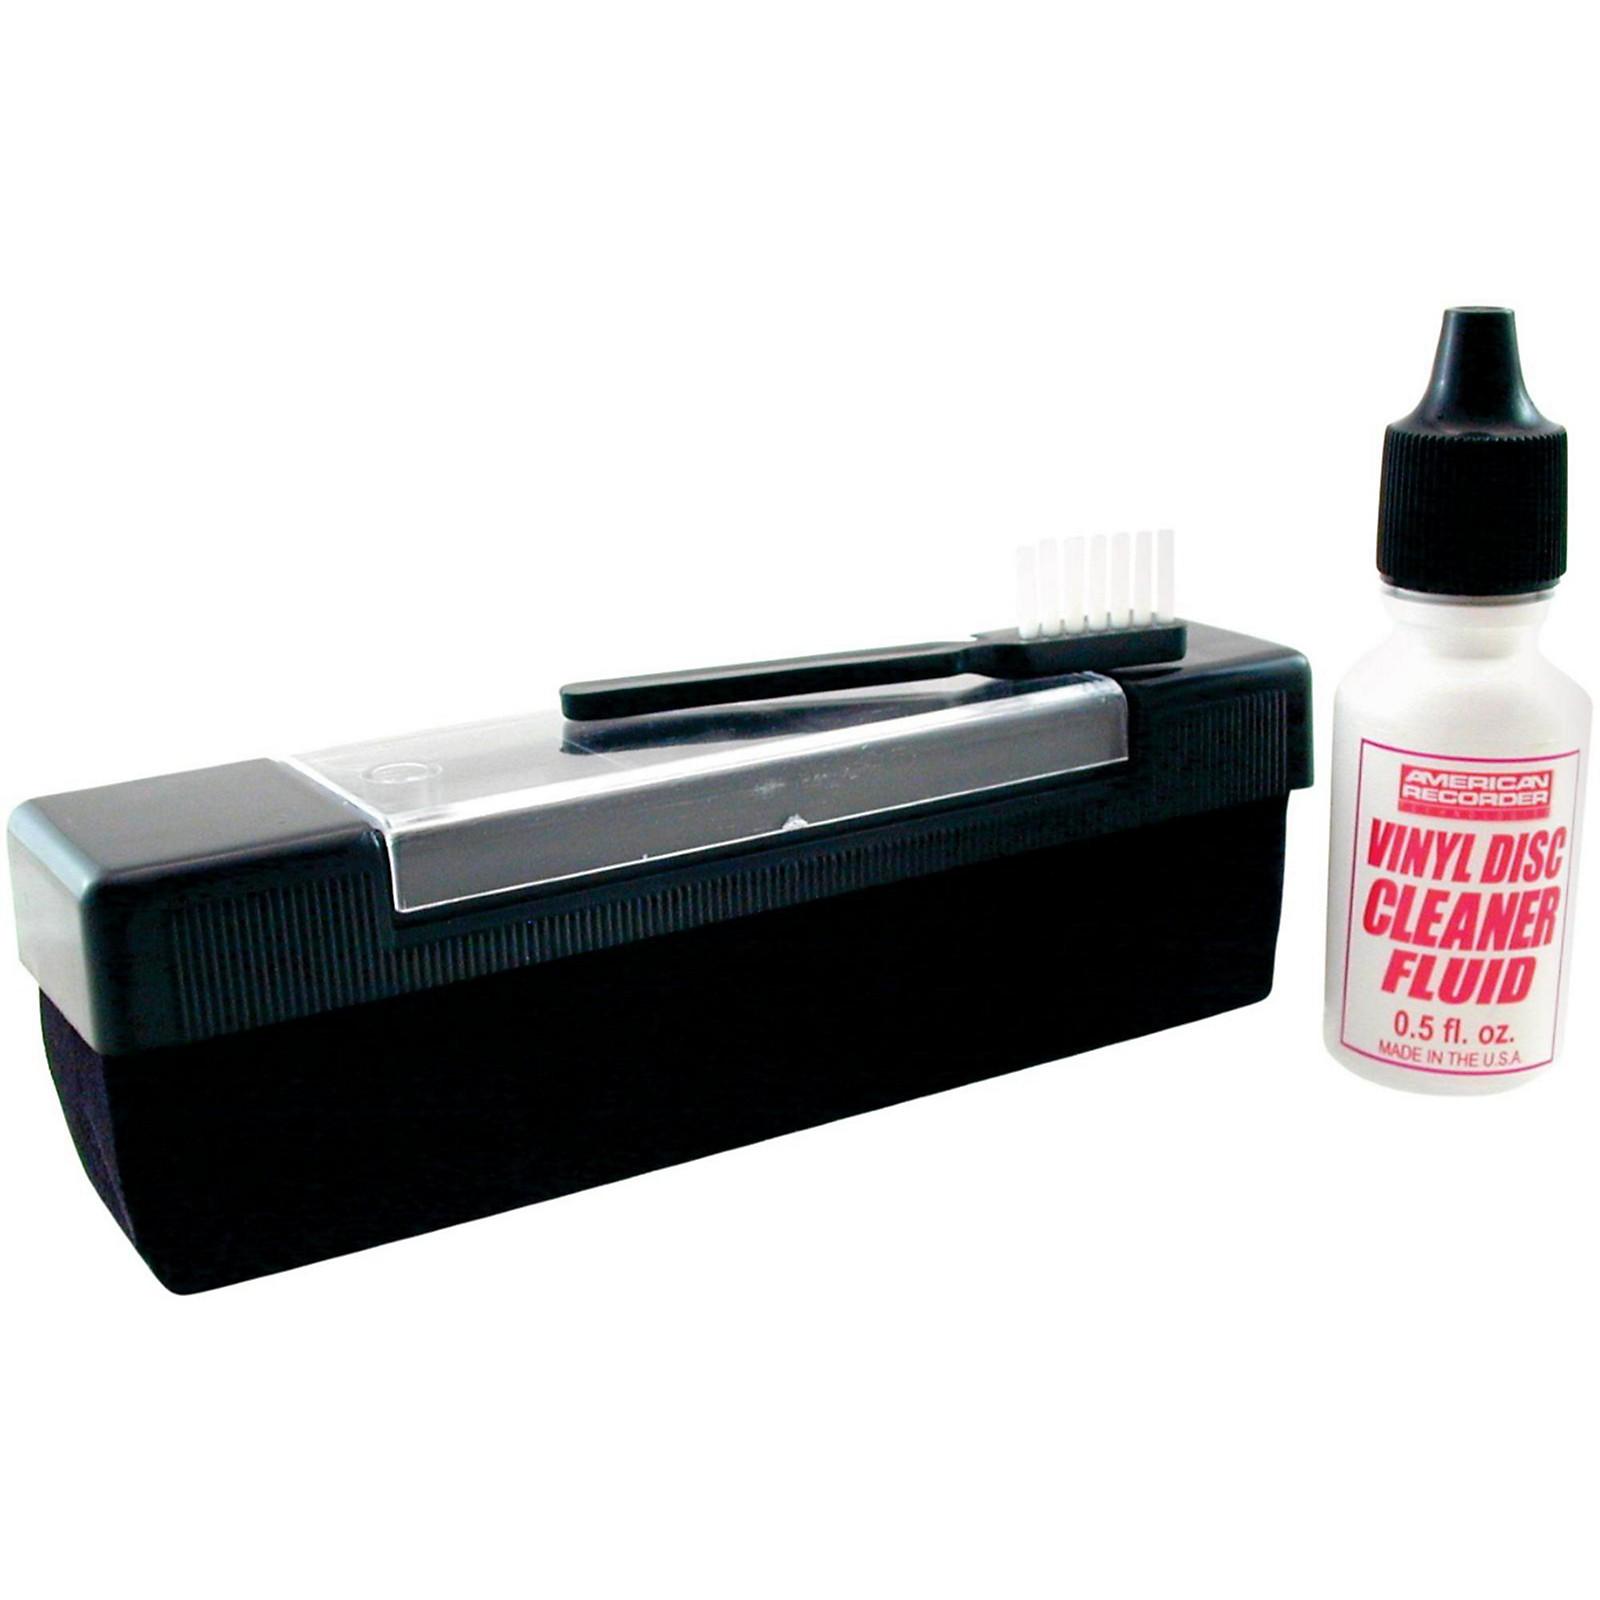 American Recorder Technologies VDC-120 Vinyl Disc Cleaner